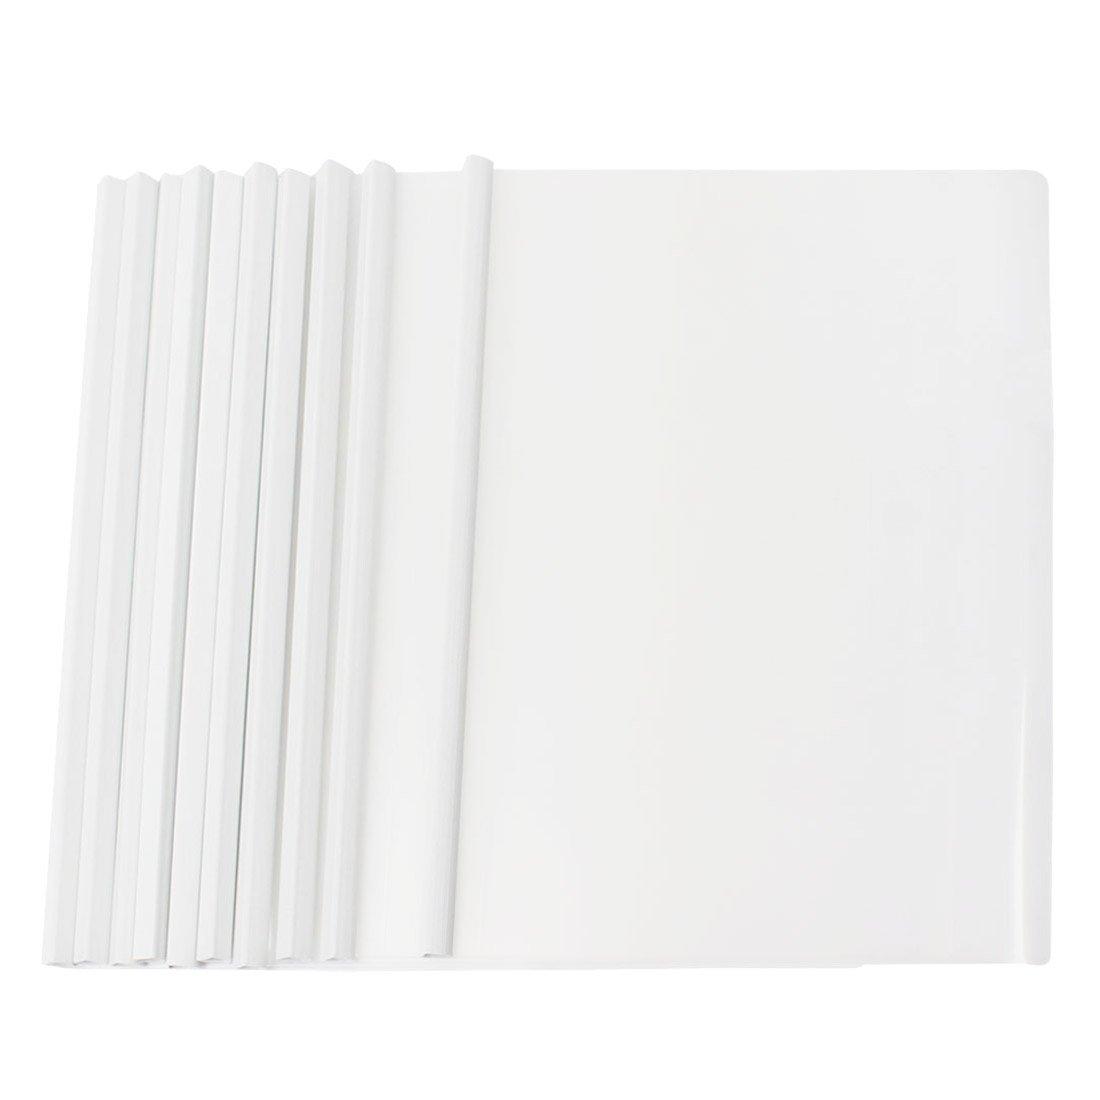 SODIAL 10 Pcs white Plastic Sliding Bar File Folder for A4 Paper Report